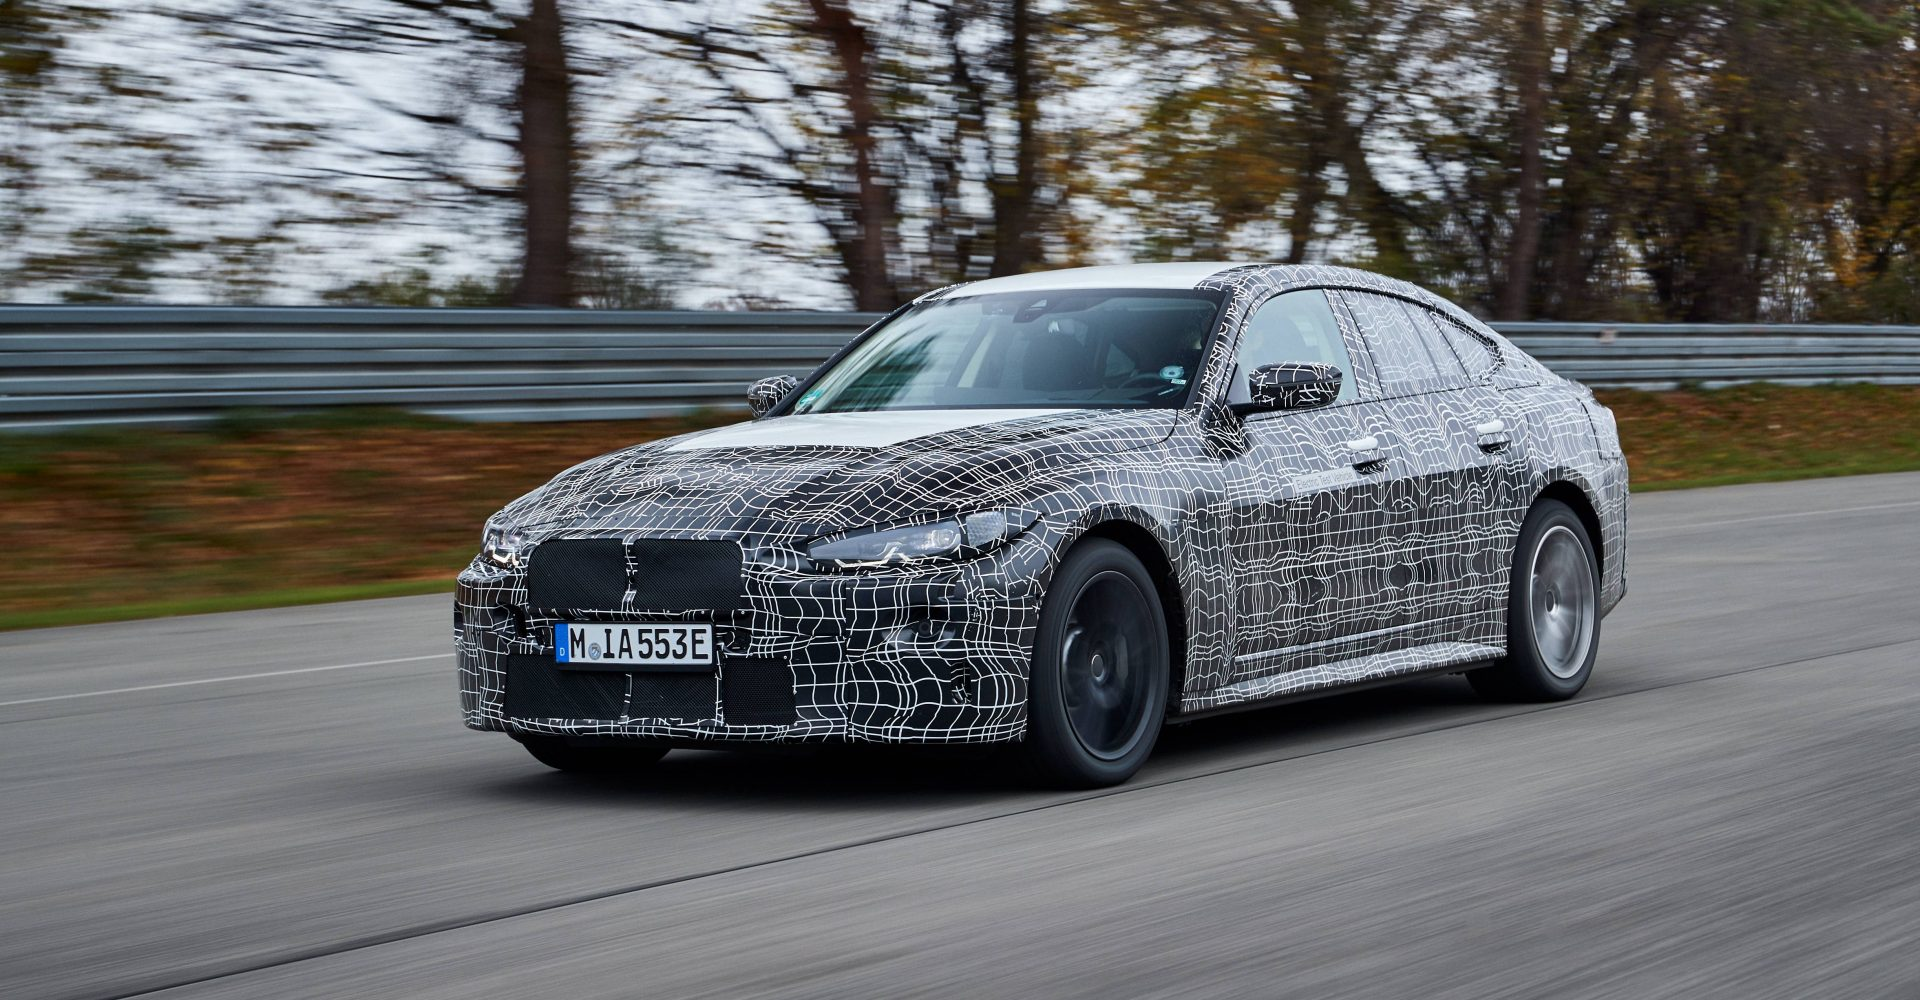 Upcoming BMW i4 showcased undergoing final dynamic testing